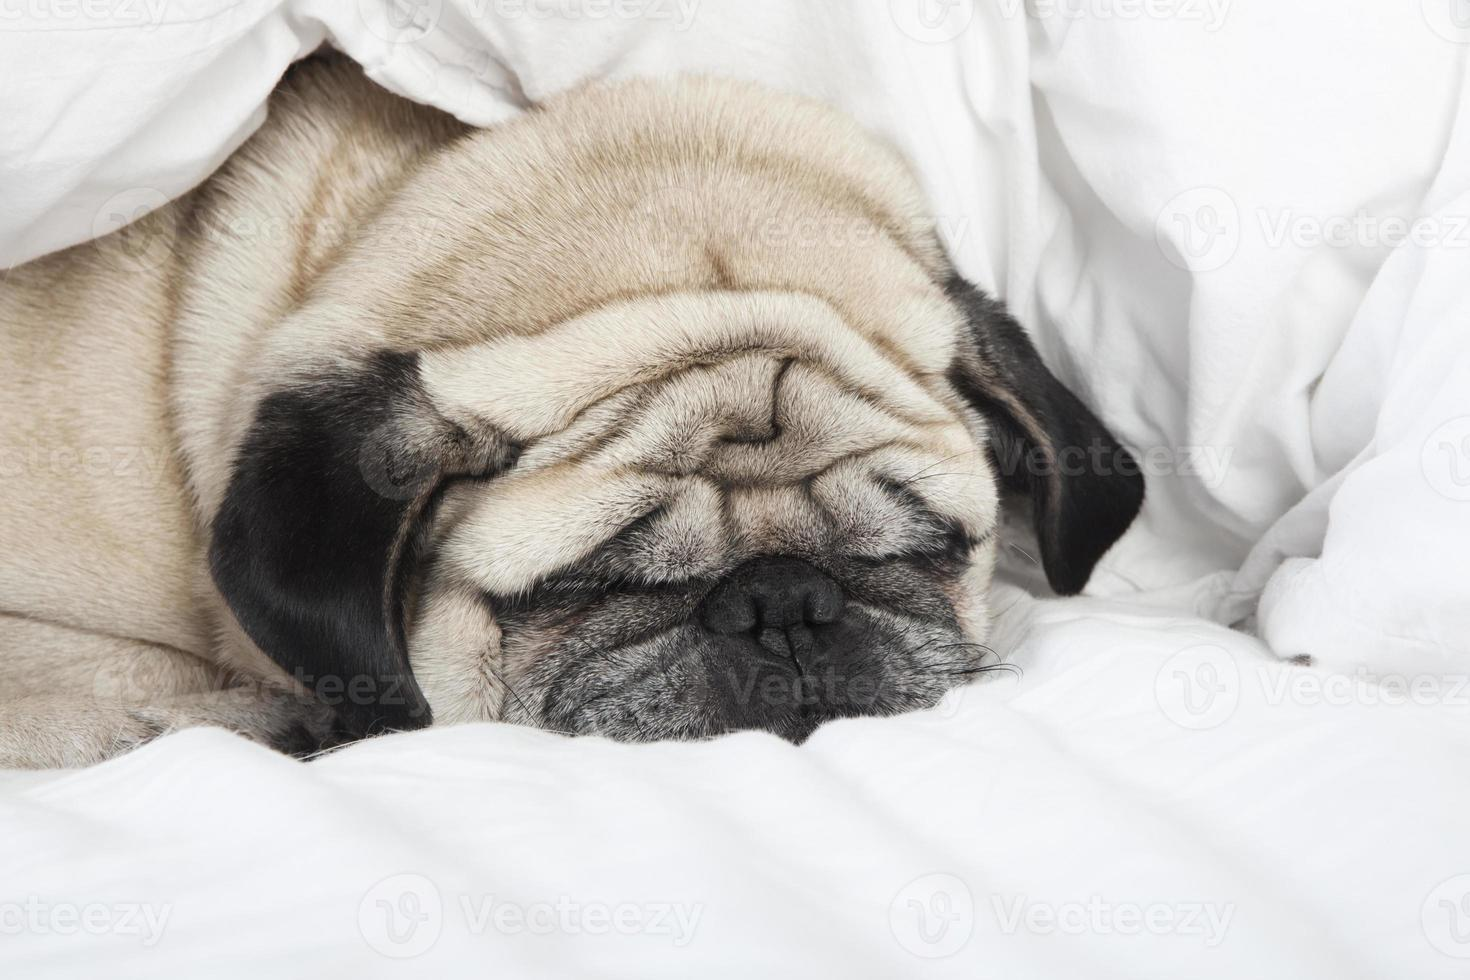 sovande mops ansikte foto